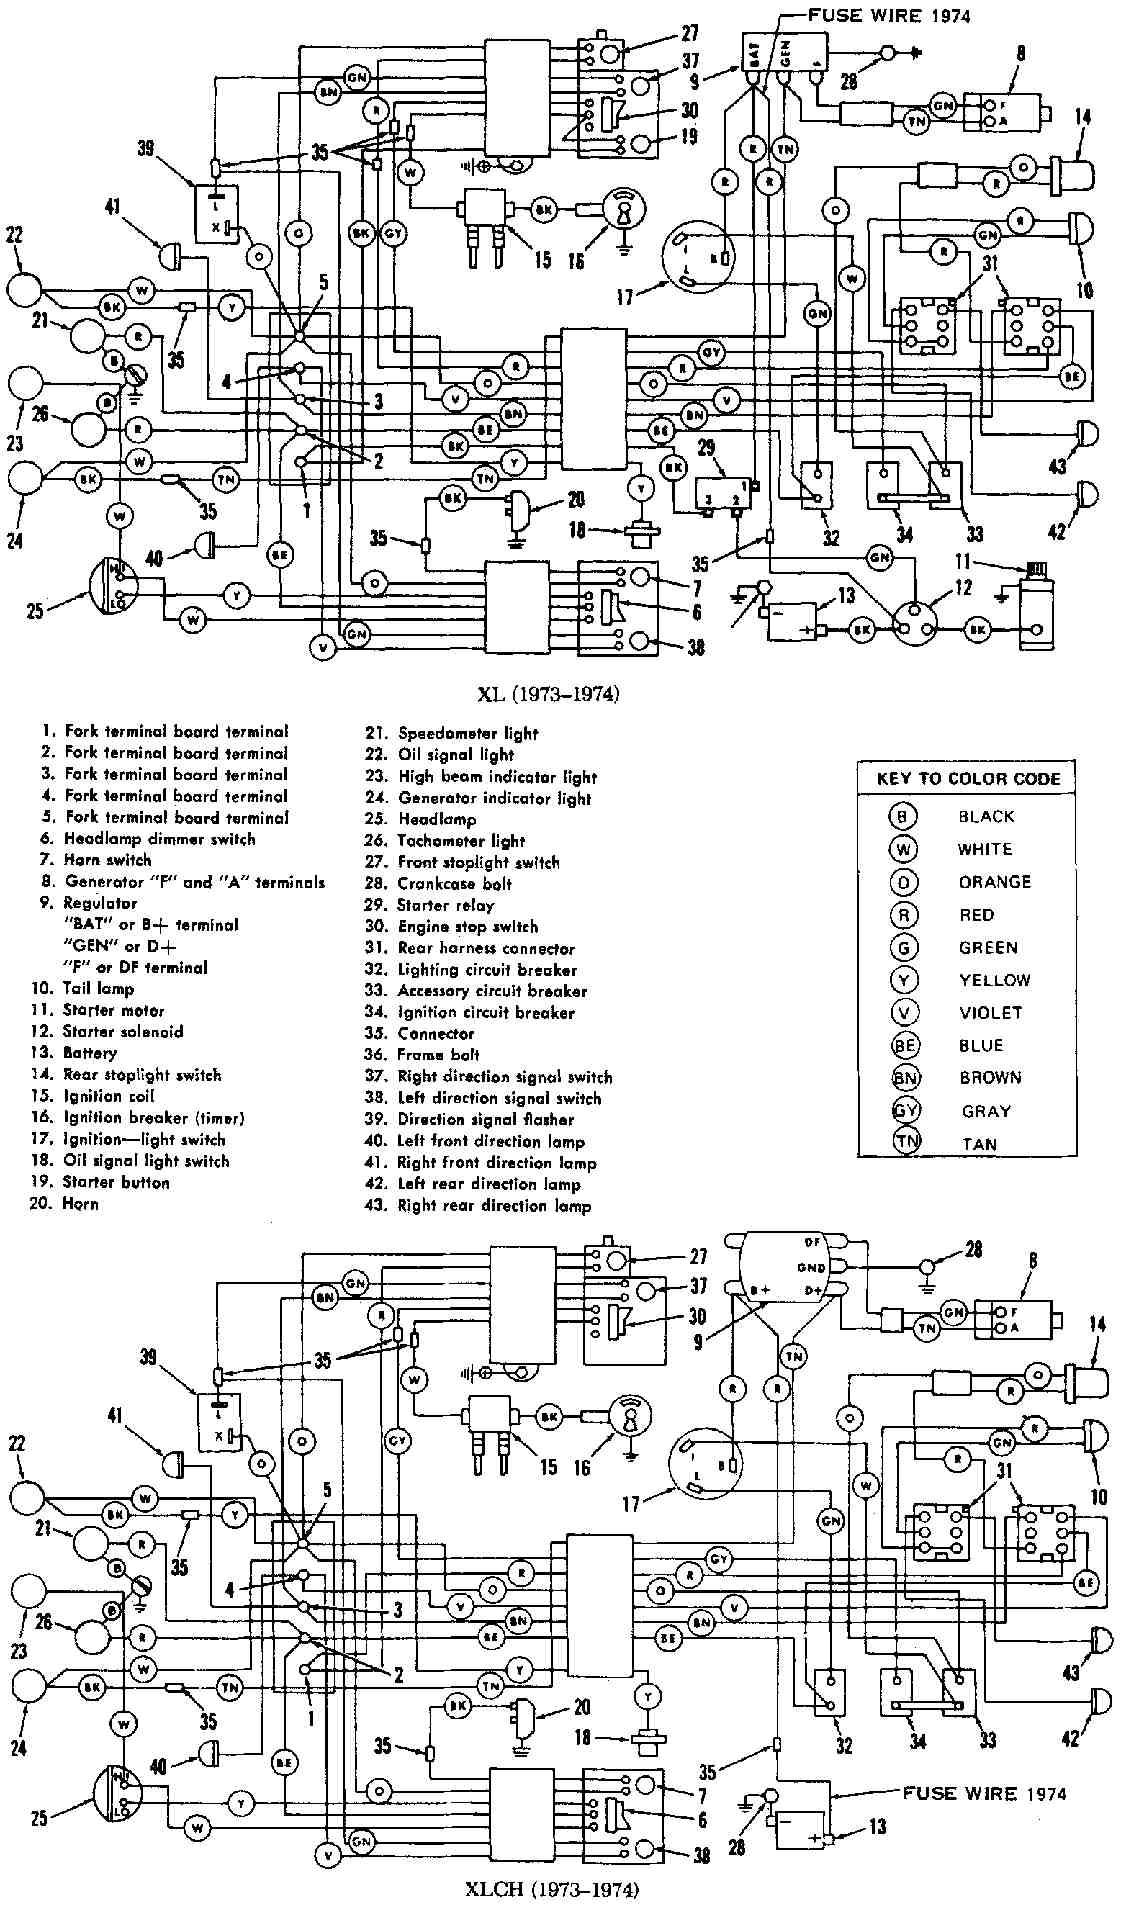 harley flh wiring harness diagram wiring diagram harley shovelhead oil  cooler harley flh wire harness schematic